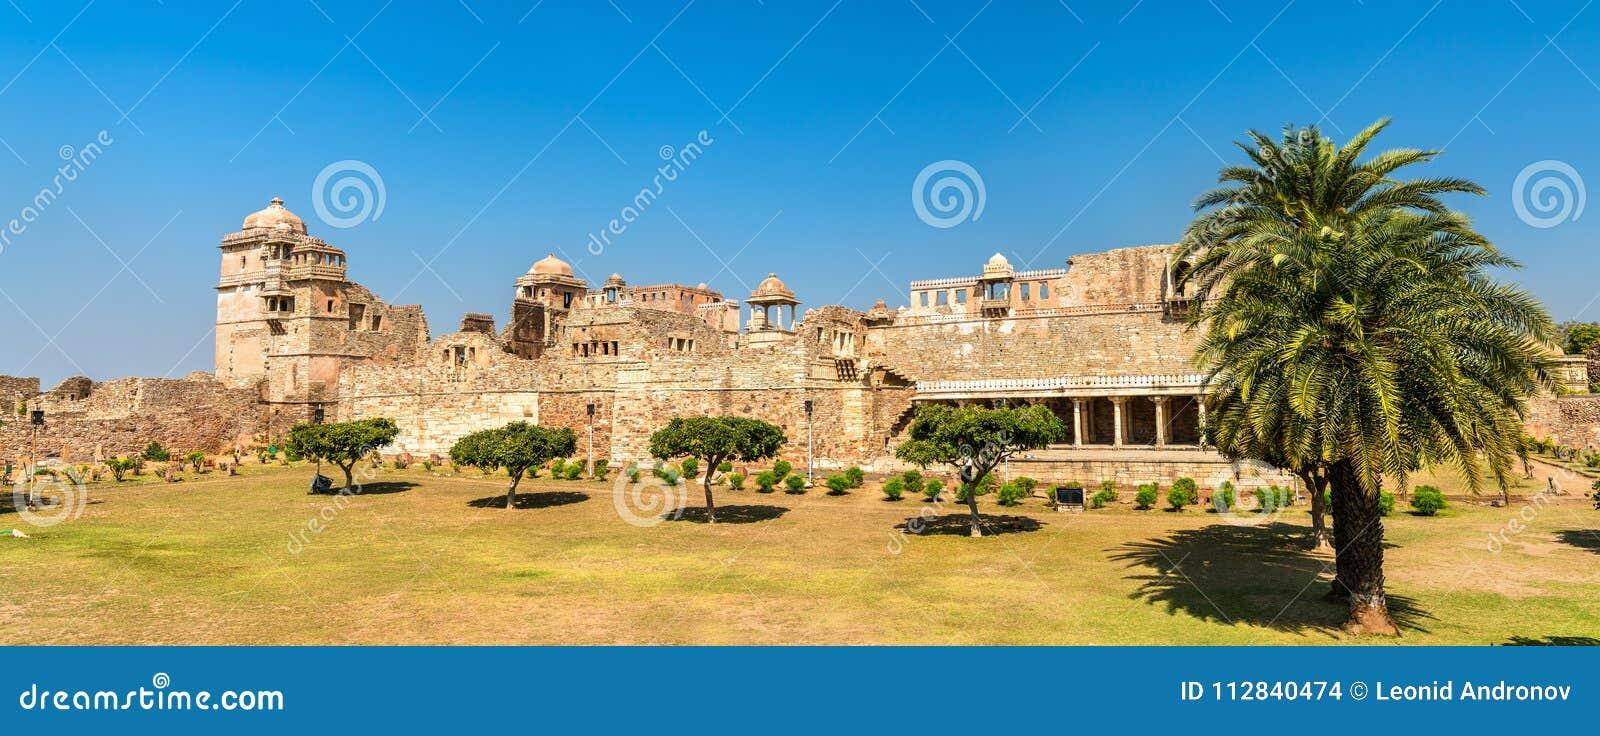 Rana Kumbha Palace, The Oldest Monument At Chittorgarh Fort